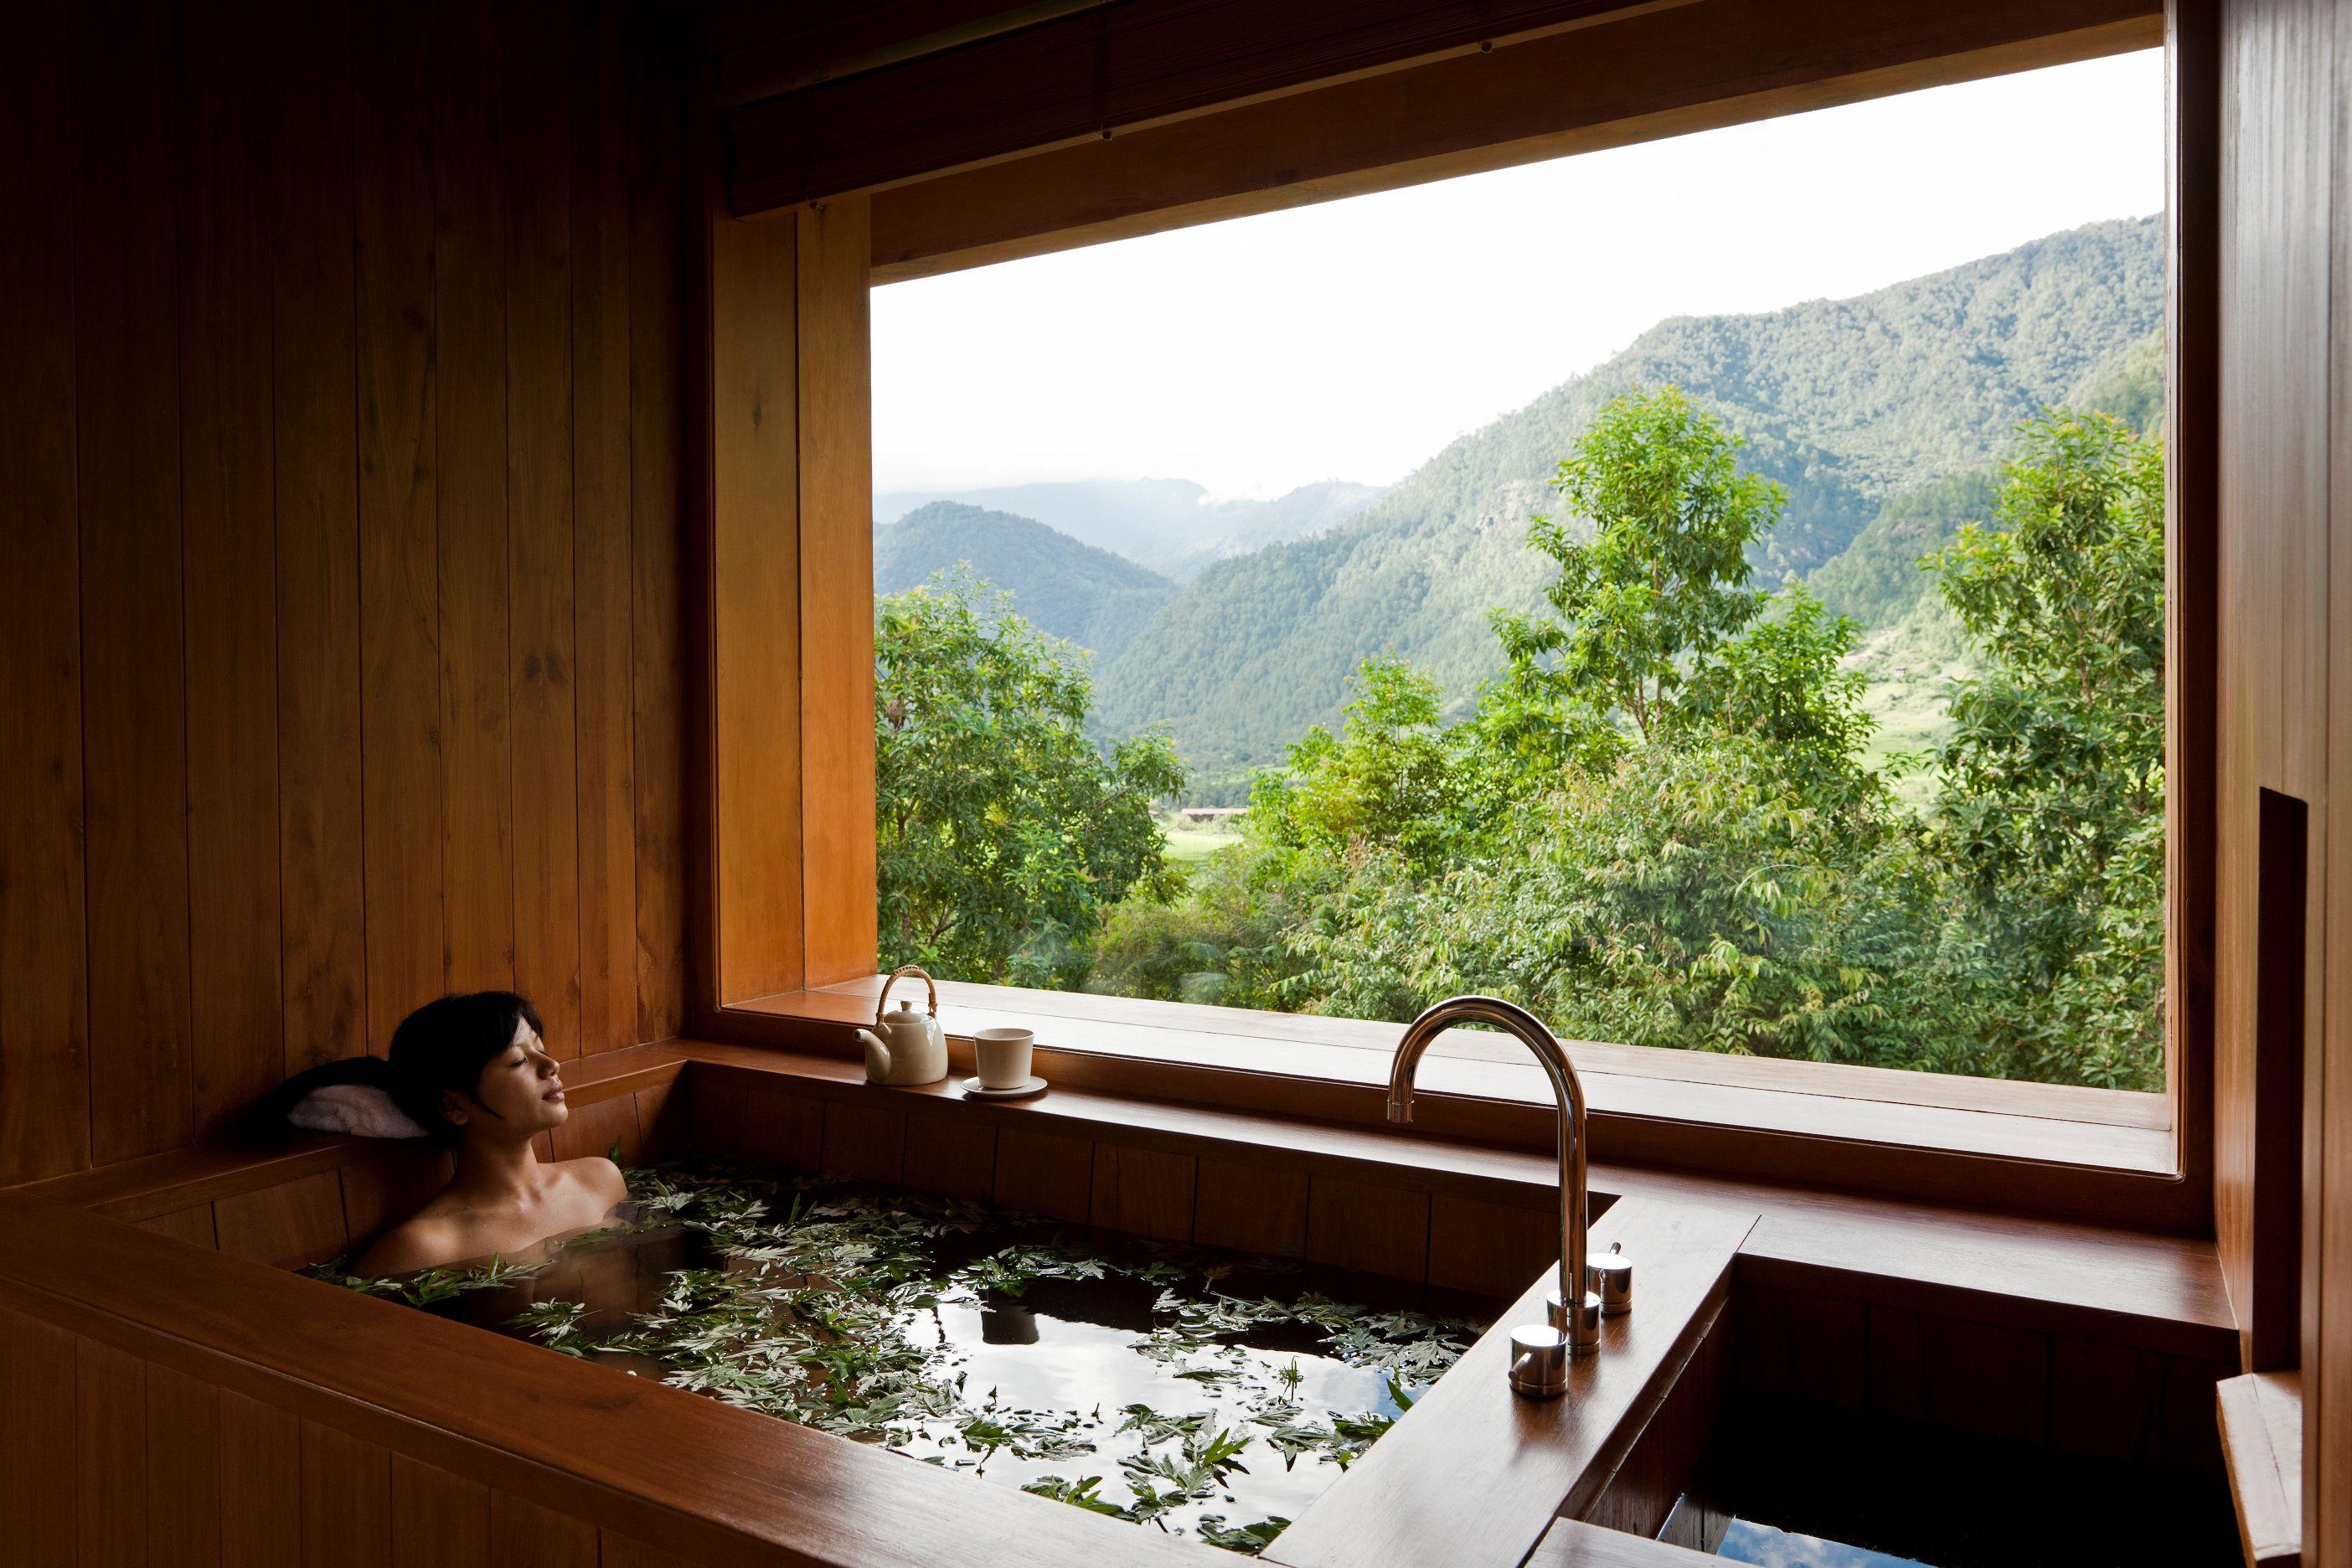 Hot Stone Baths In Bhutan - Ancient Bhutanese Tradition